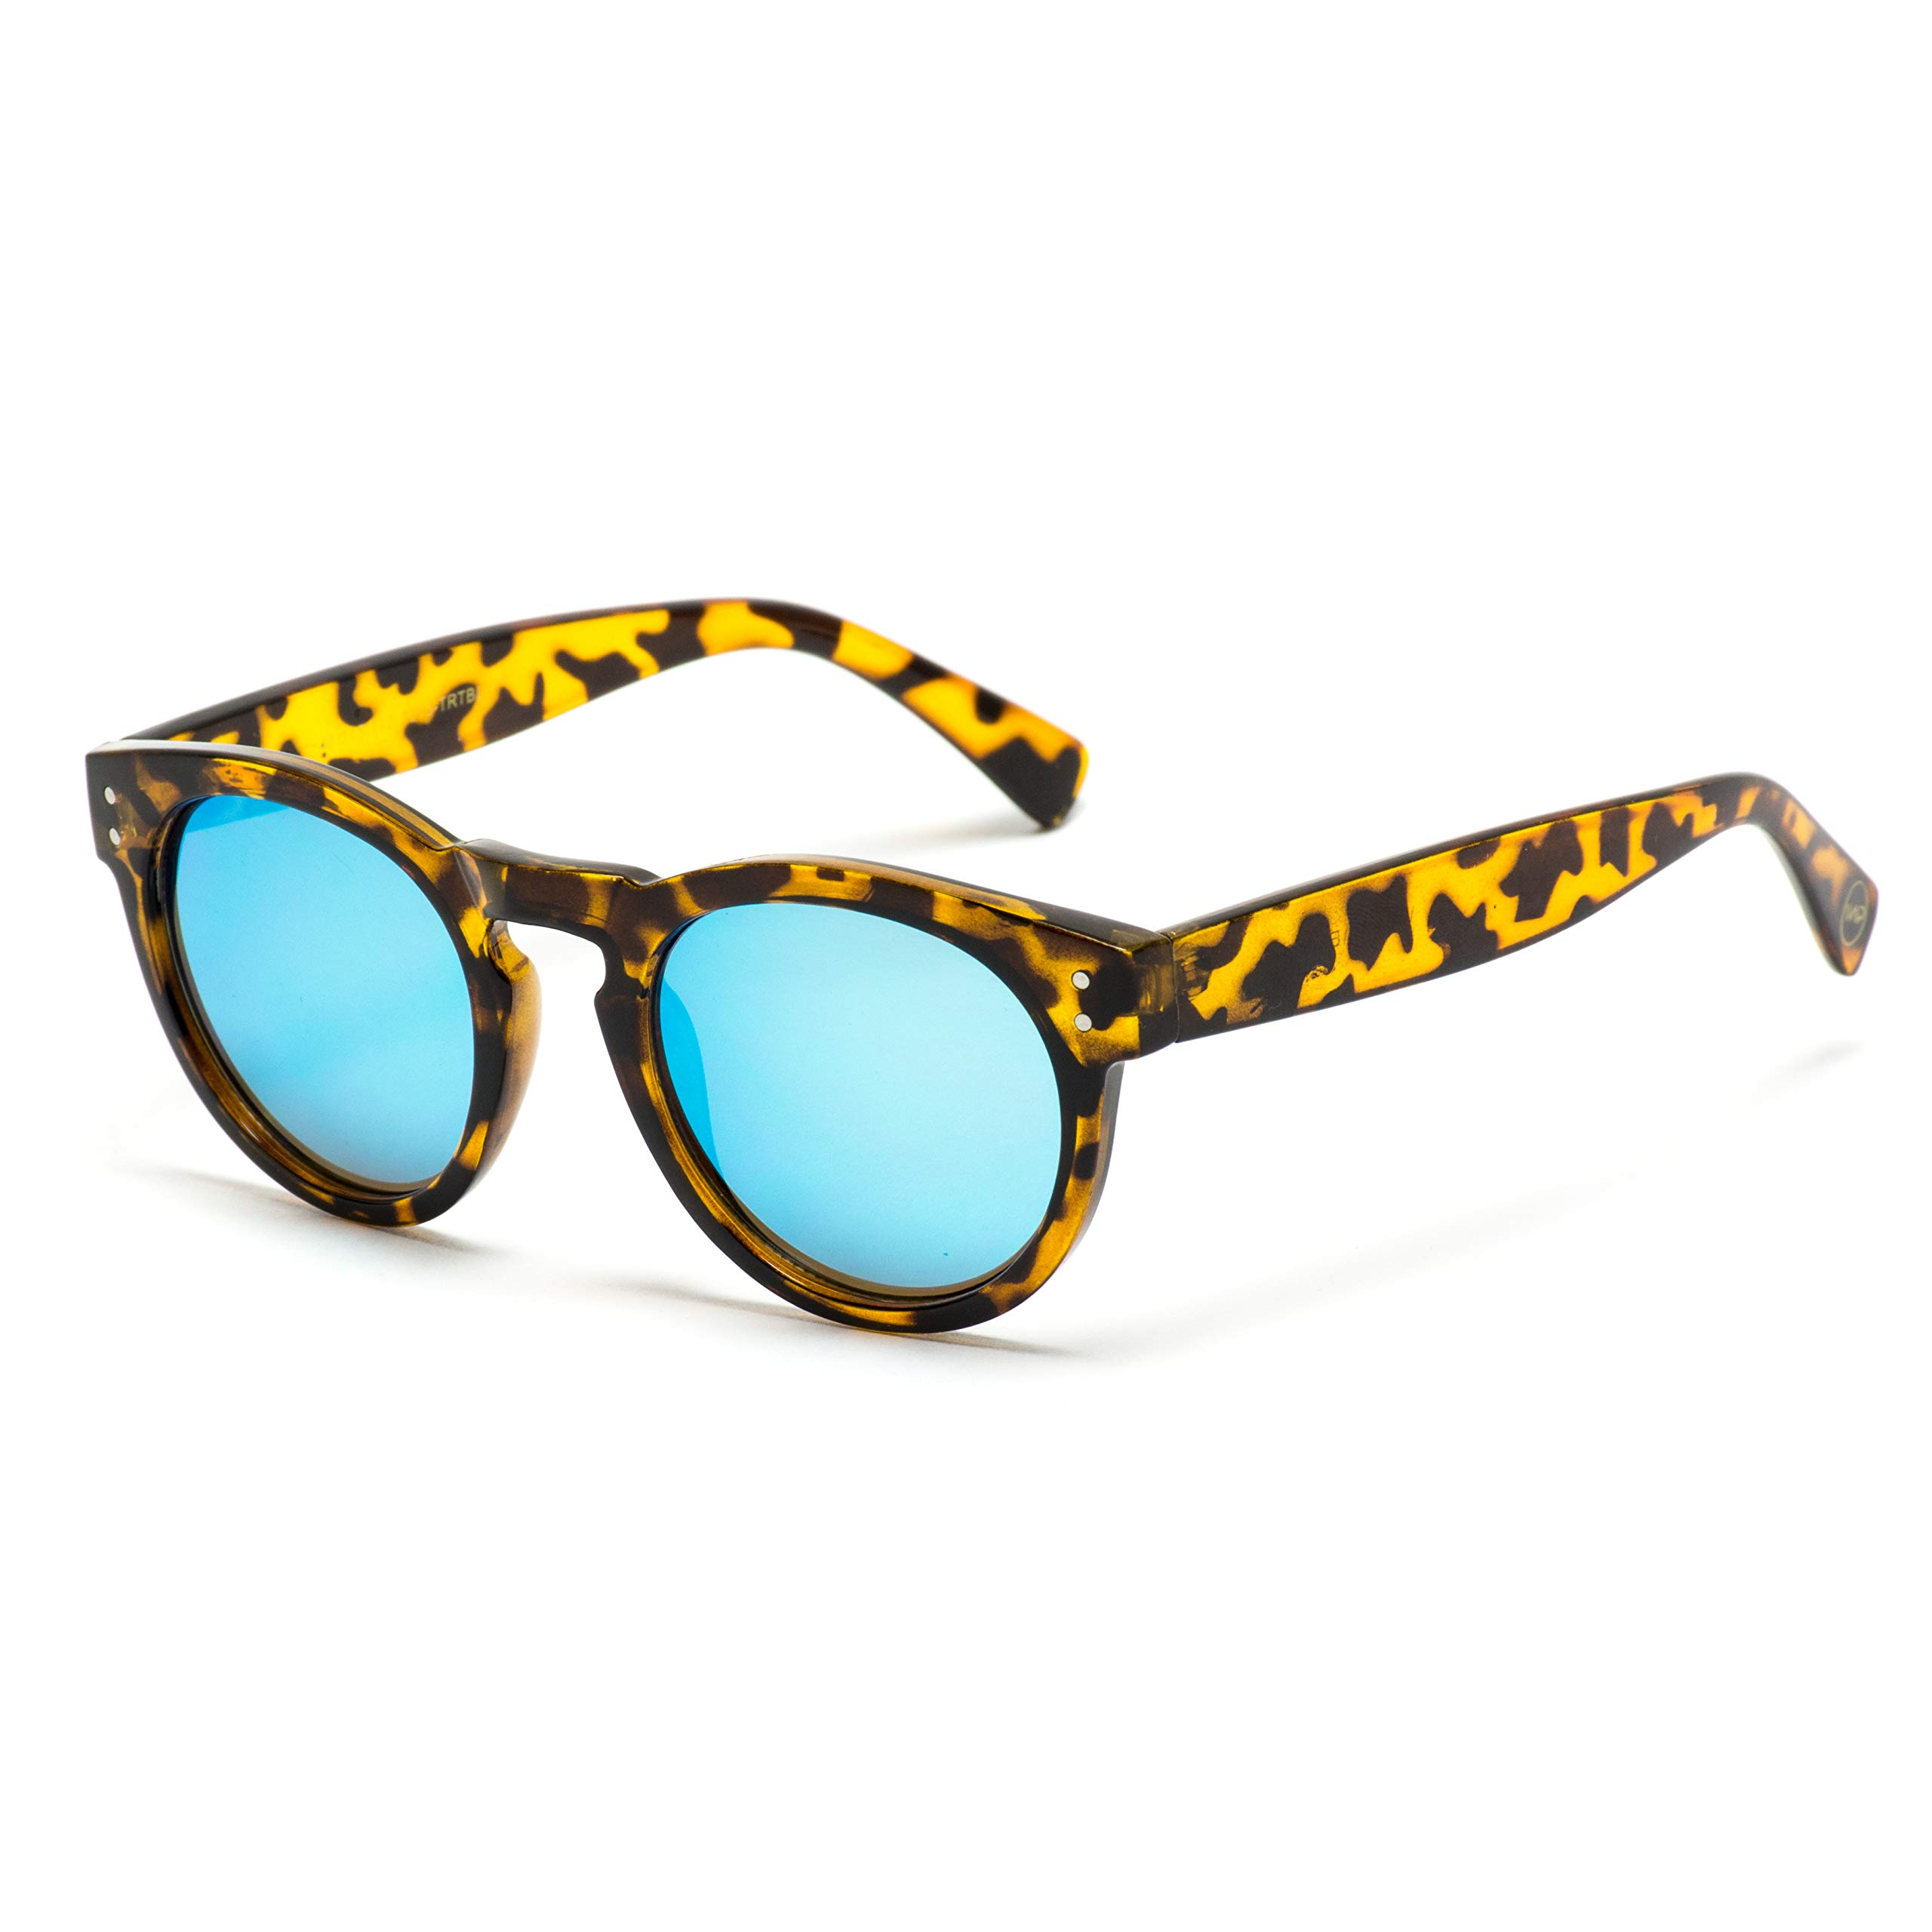 Vintage Inspired Mirror Lens Round Horned Rim Frame Retro Sunglasses by WearMe Pro